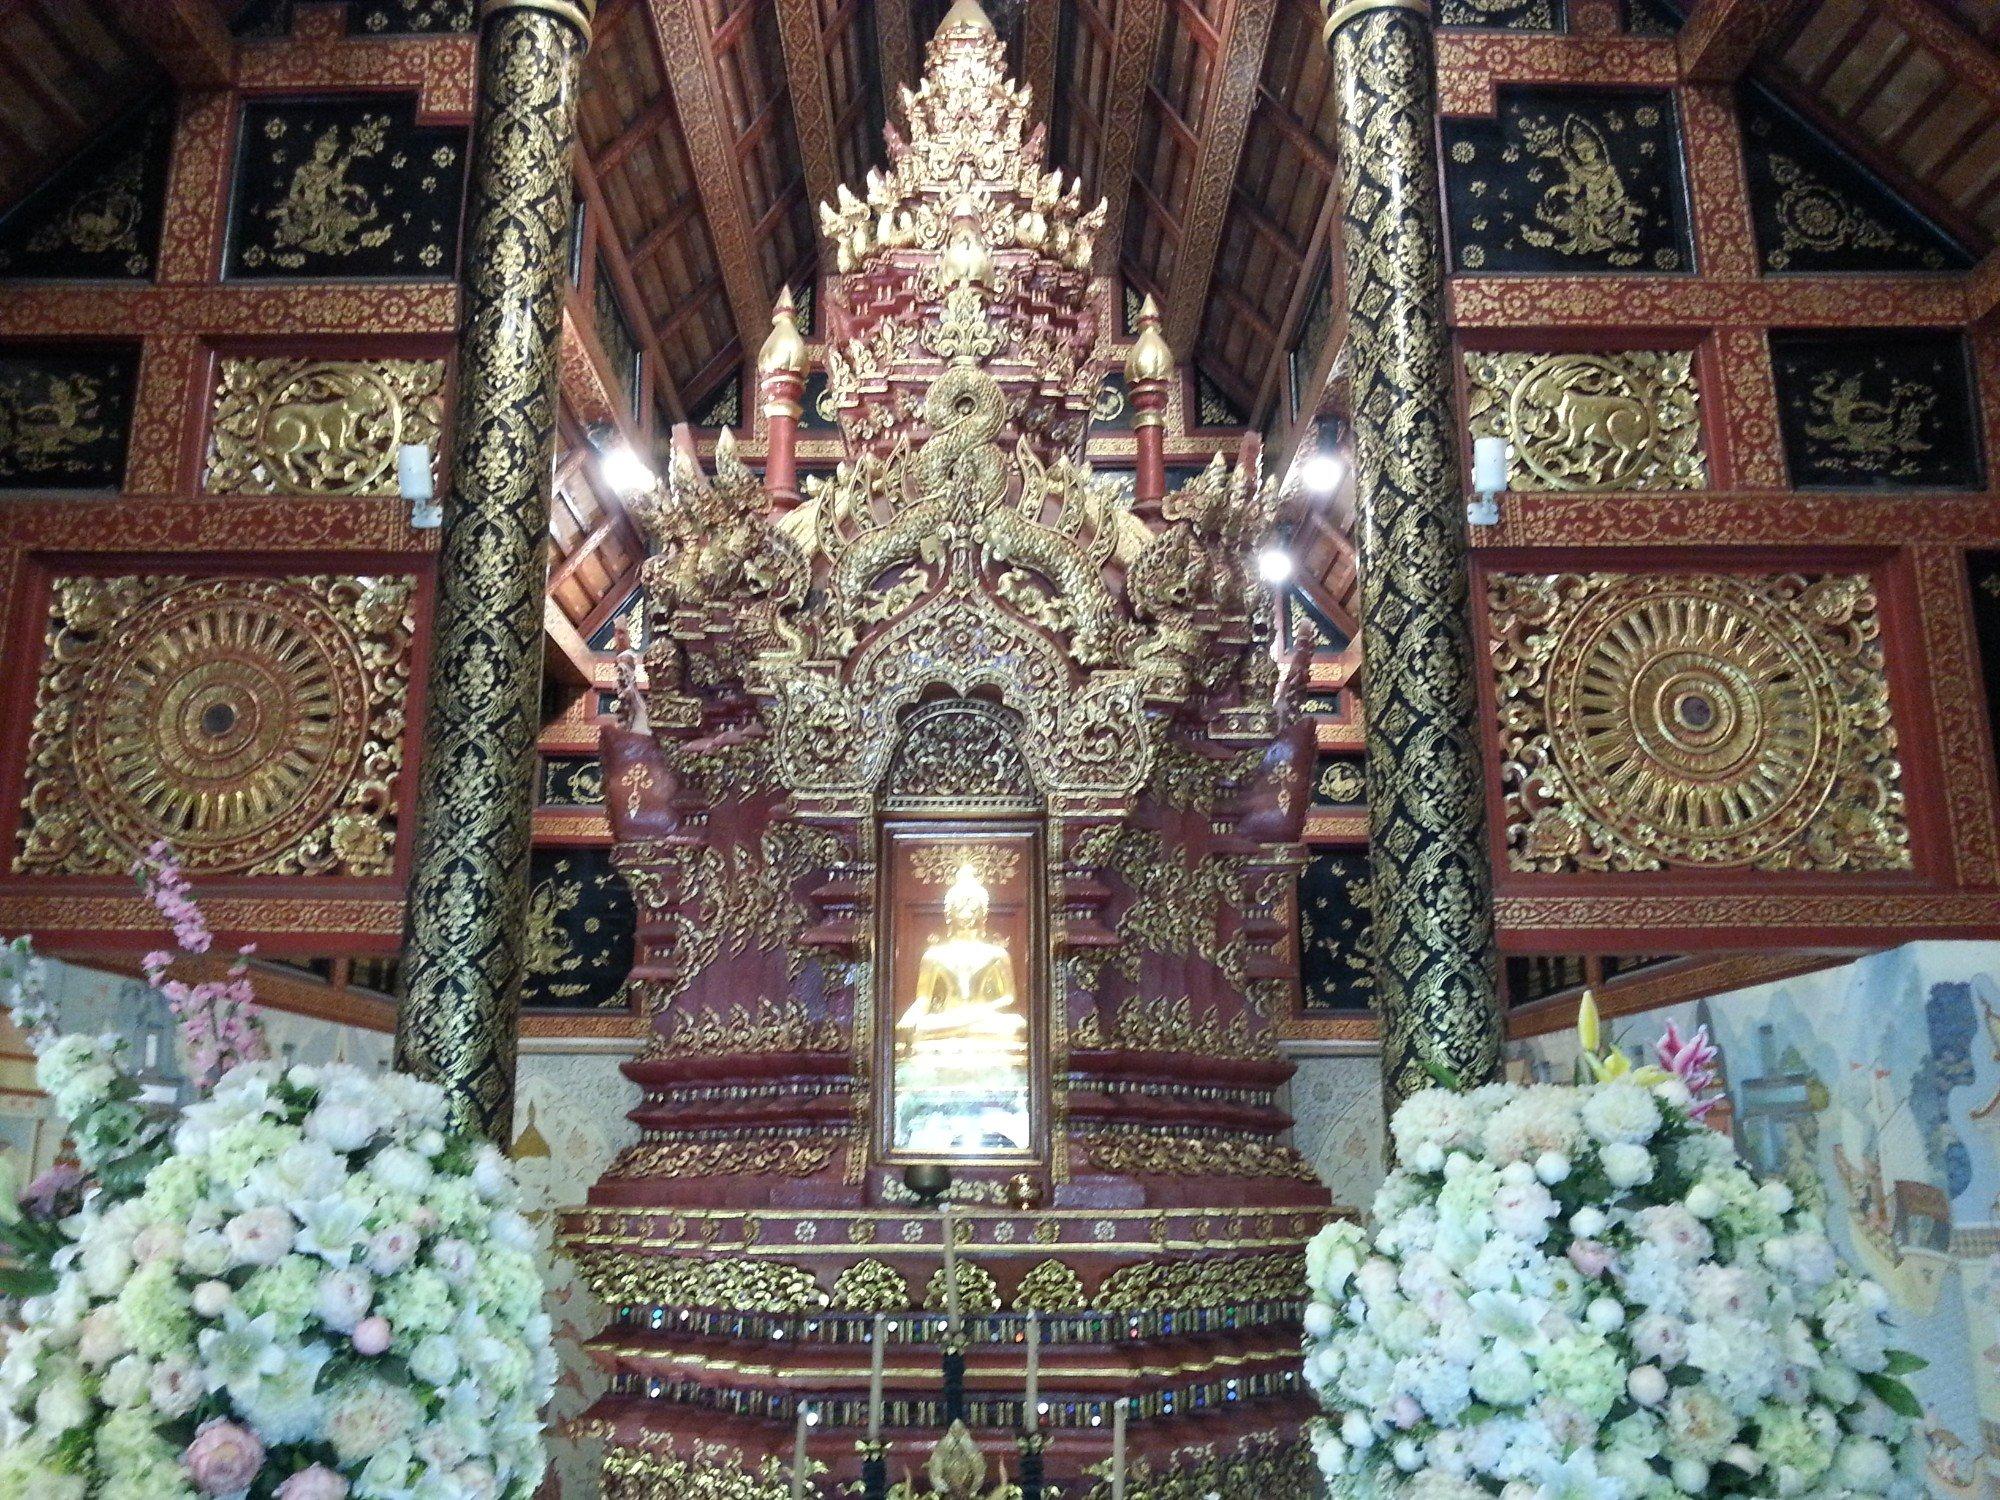 Inside the prayer hall at Wat Phra Sing